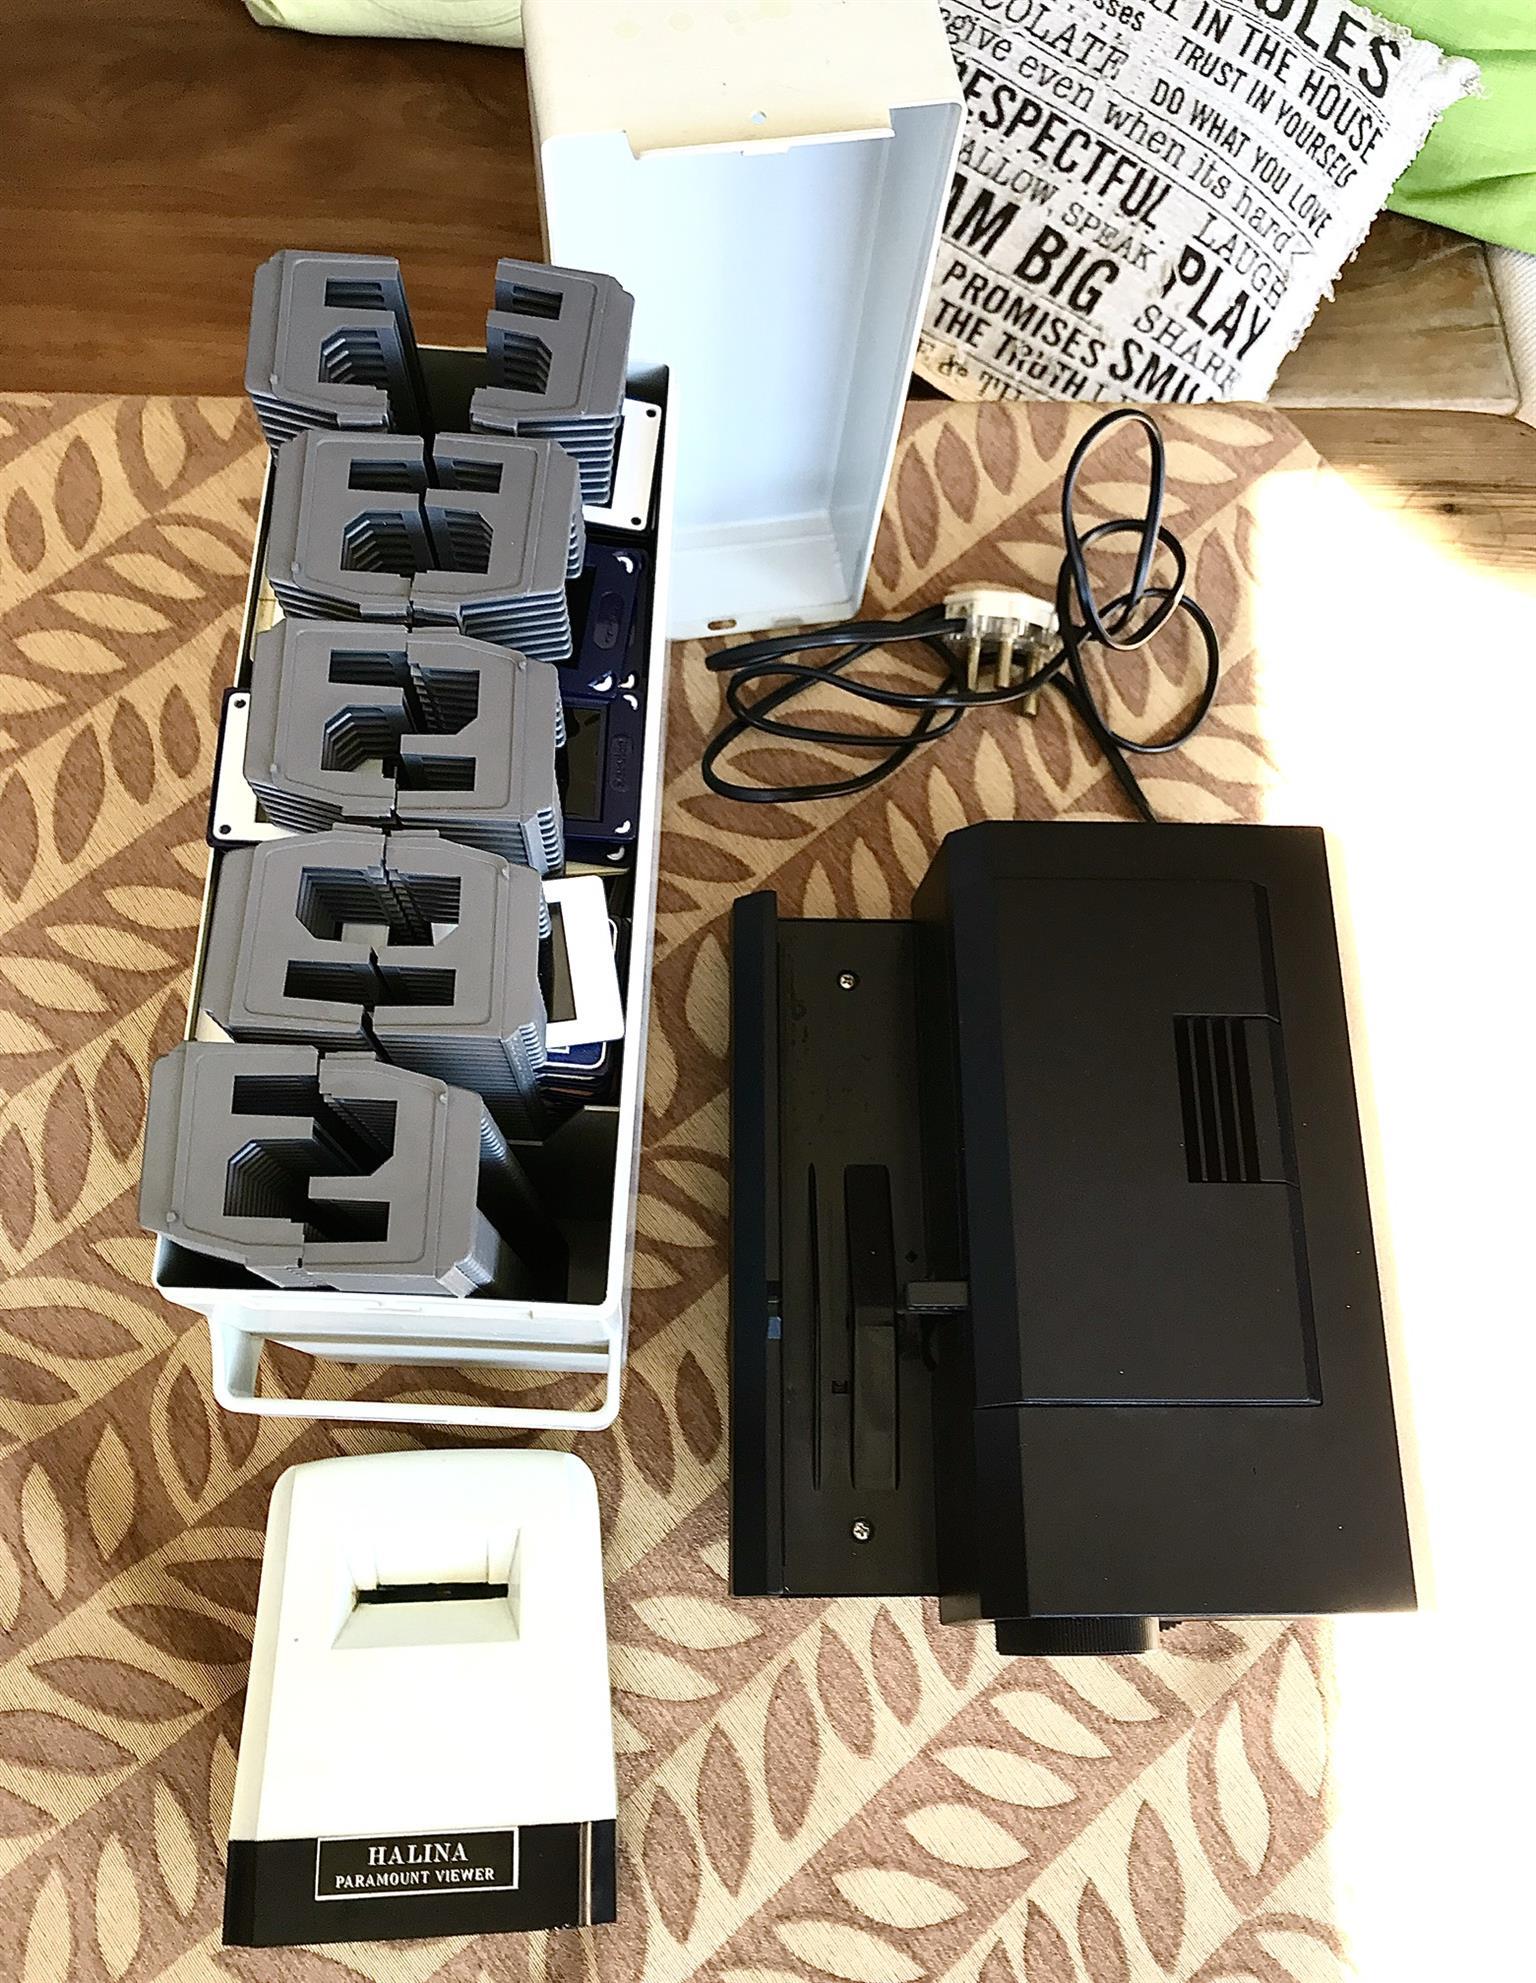 Slide photo projector